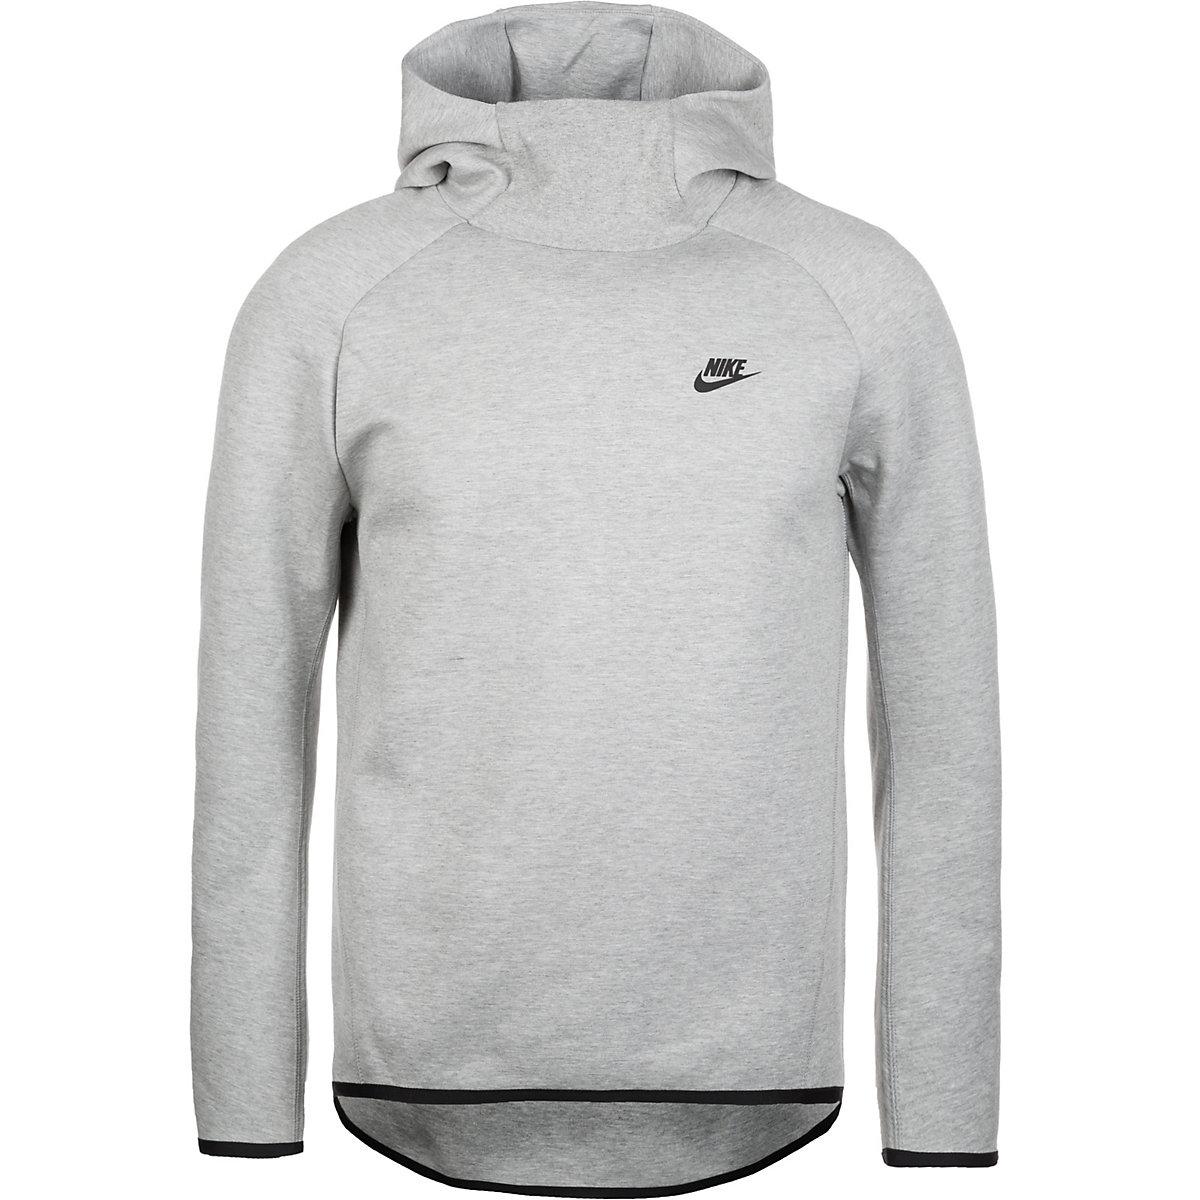 Nike Kapuzenpullover Grau